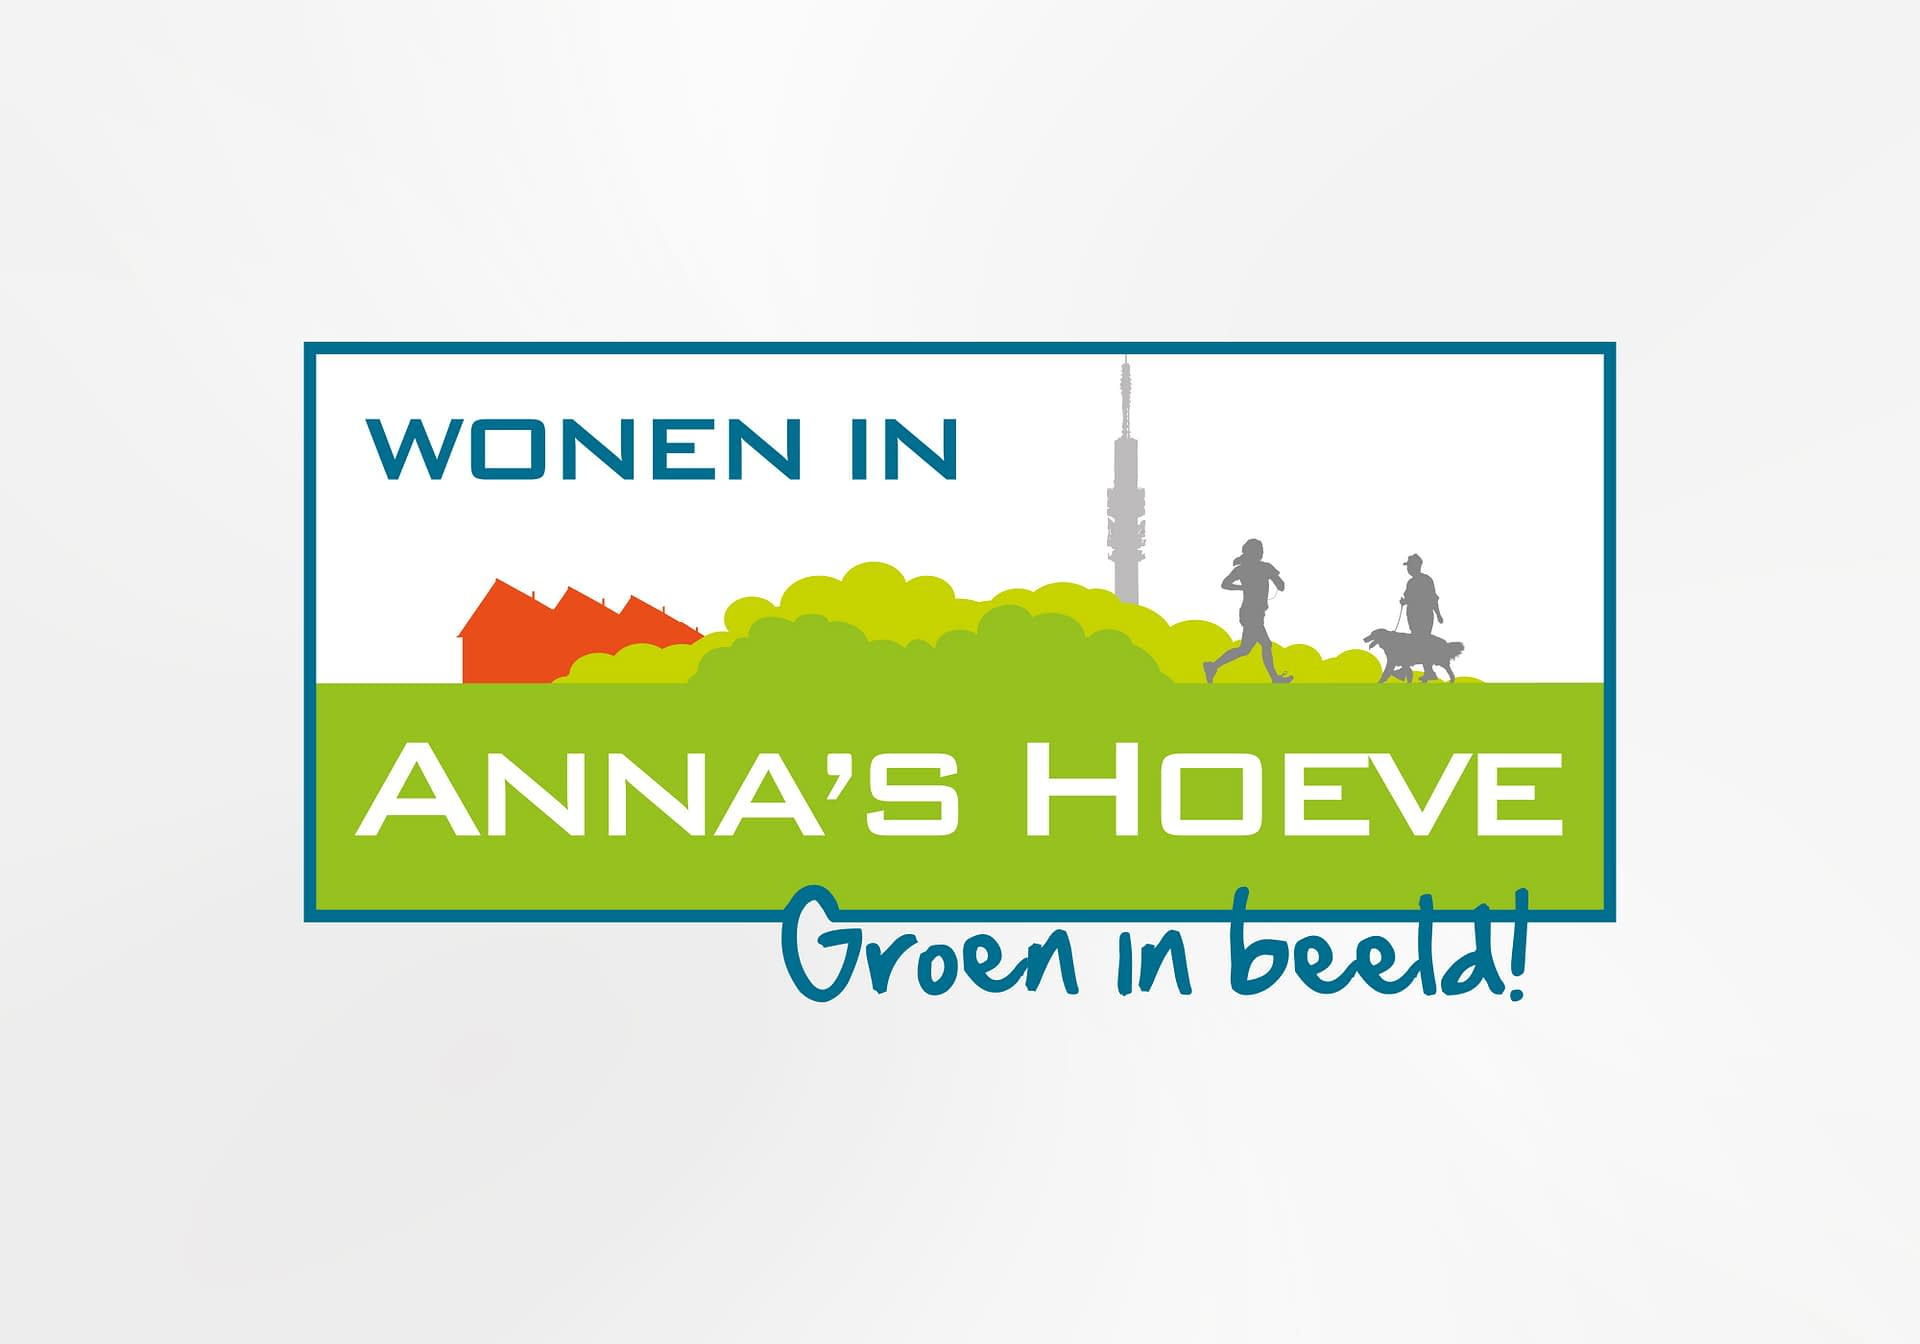 Anna's Hoeve